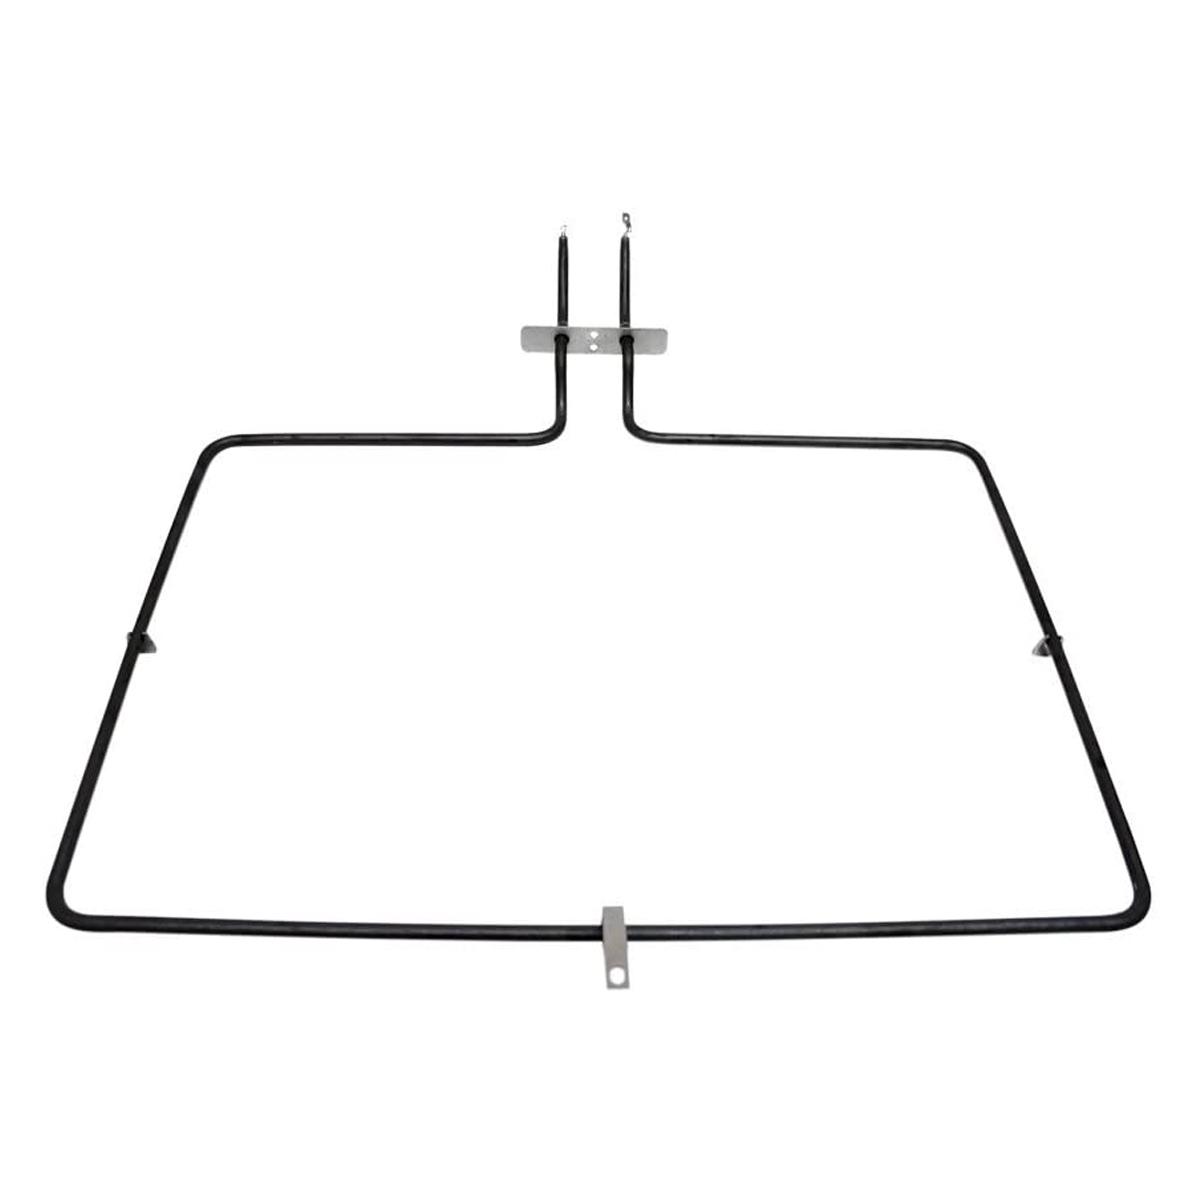 Maytag MER8775AS0 Oven Bake Element (Lower) Genuine OEM